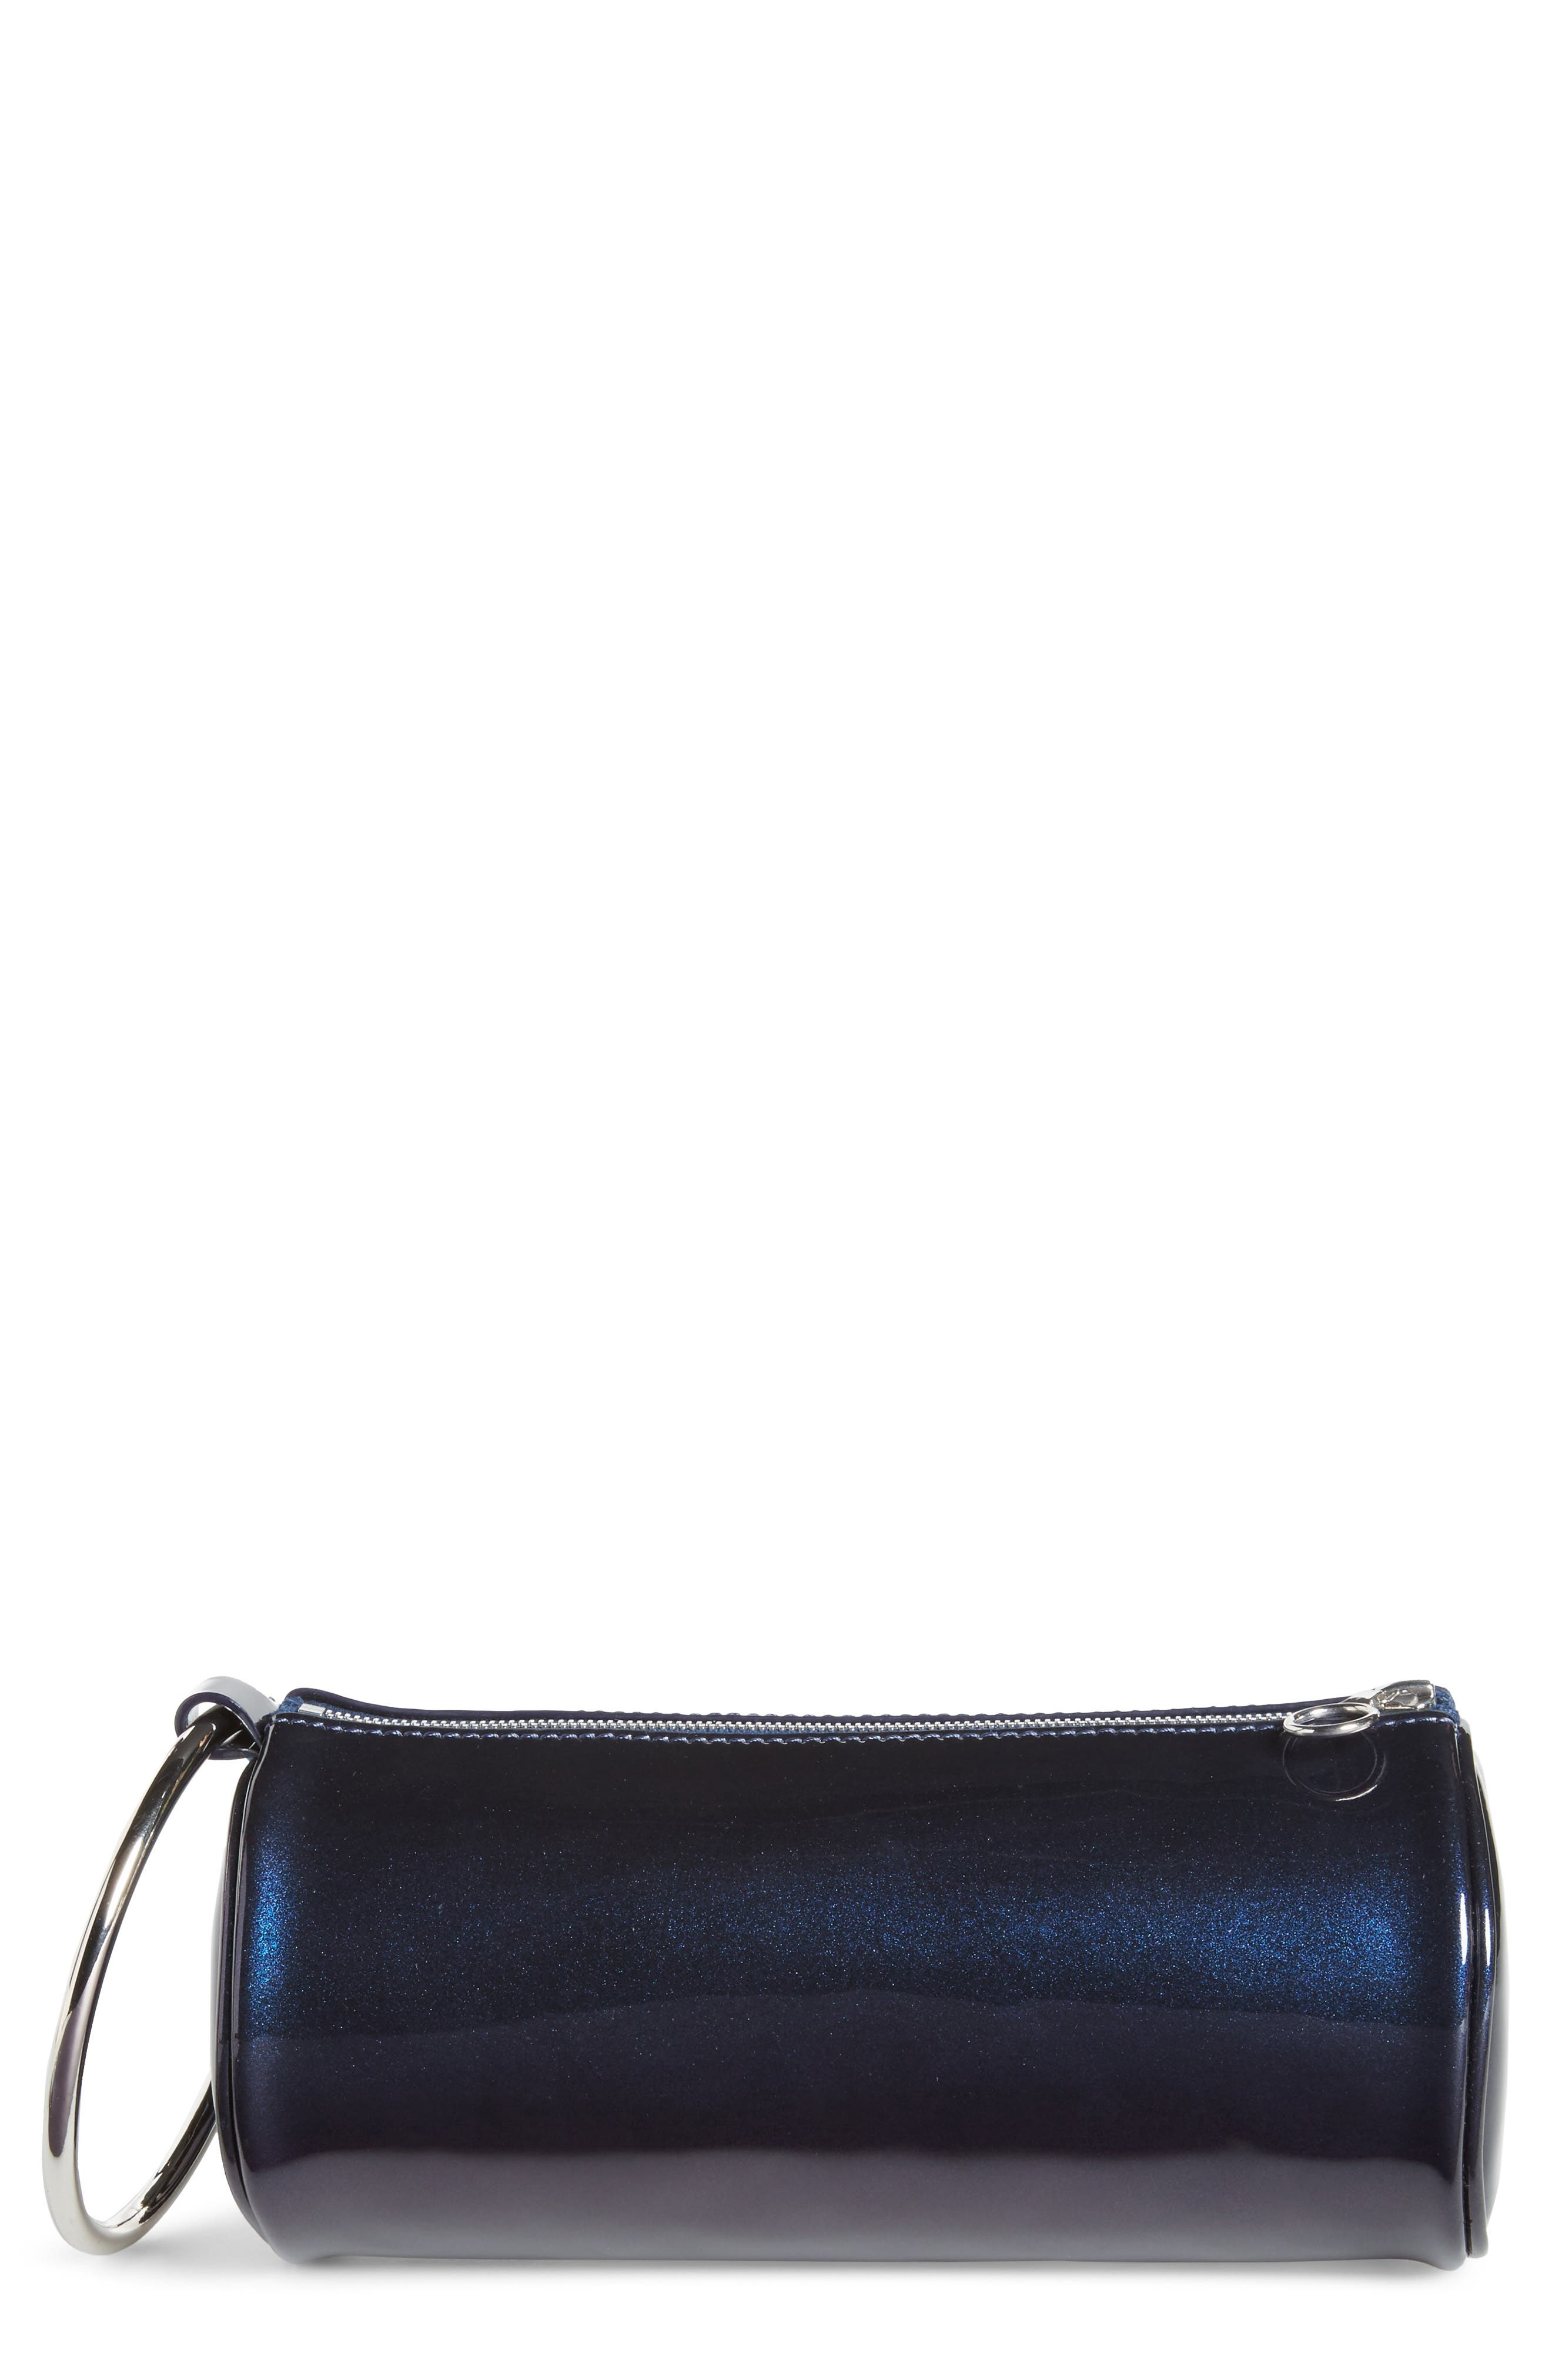 Iridescent Leather Duffel Wristlet Clutch,                         Main,                         color,